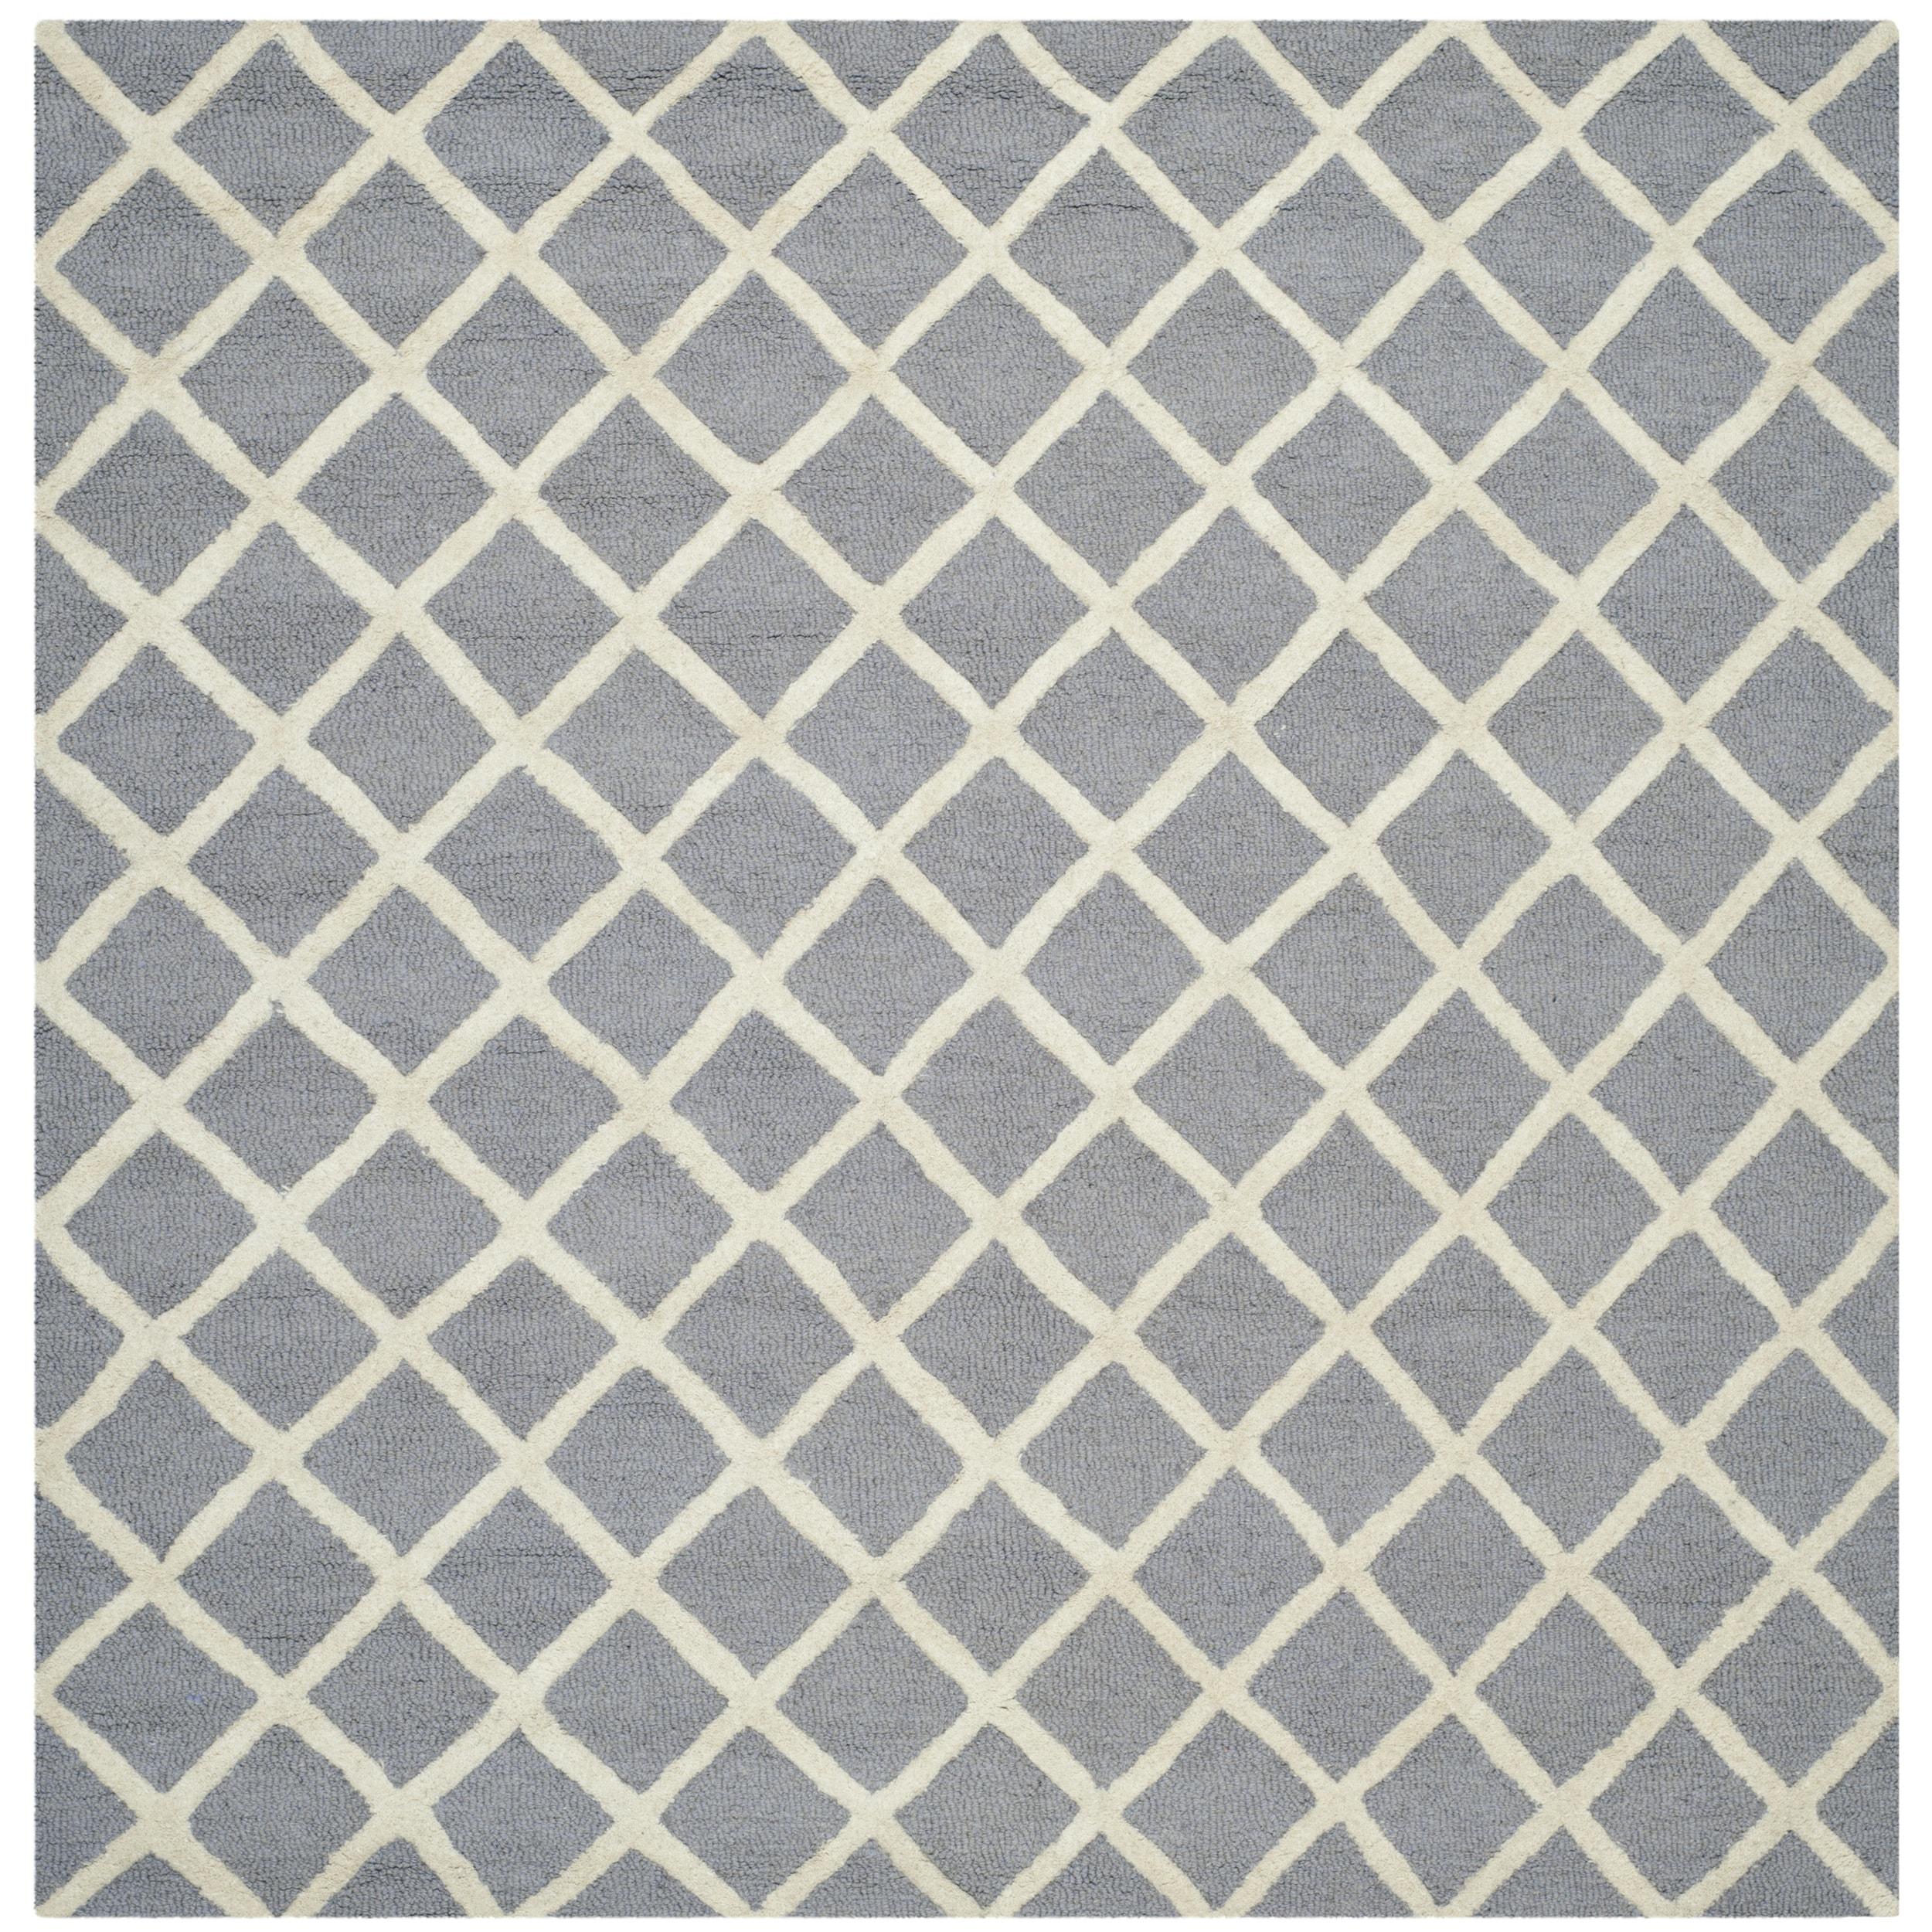 Safavieh Handmade Cambridge Moroccan Silver Small-Square-Pattern Wool Rug (6' Square) at Sears.com